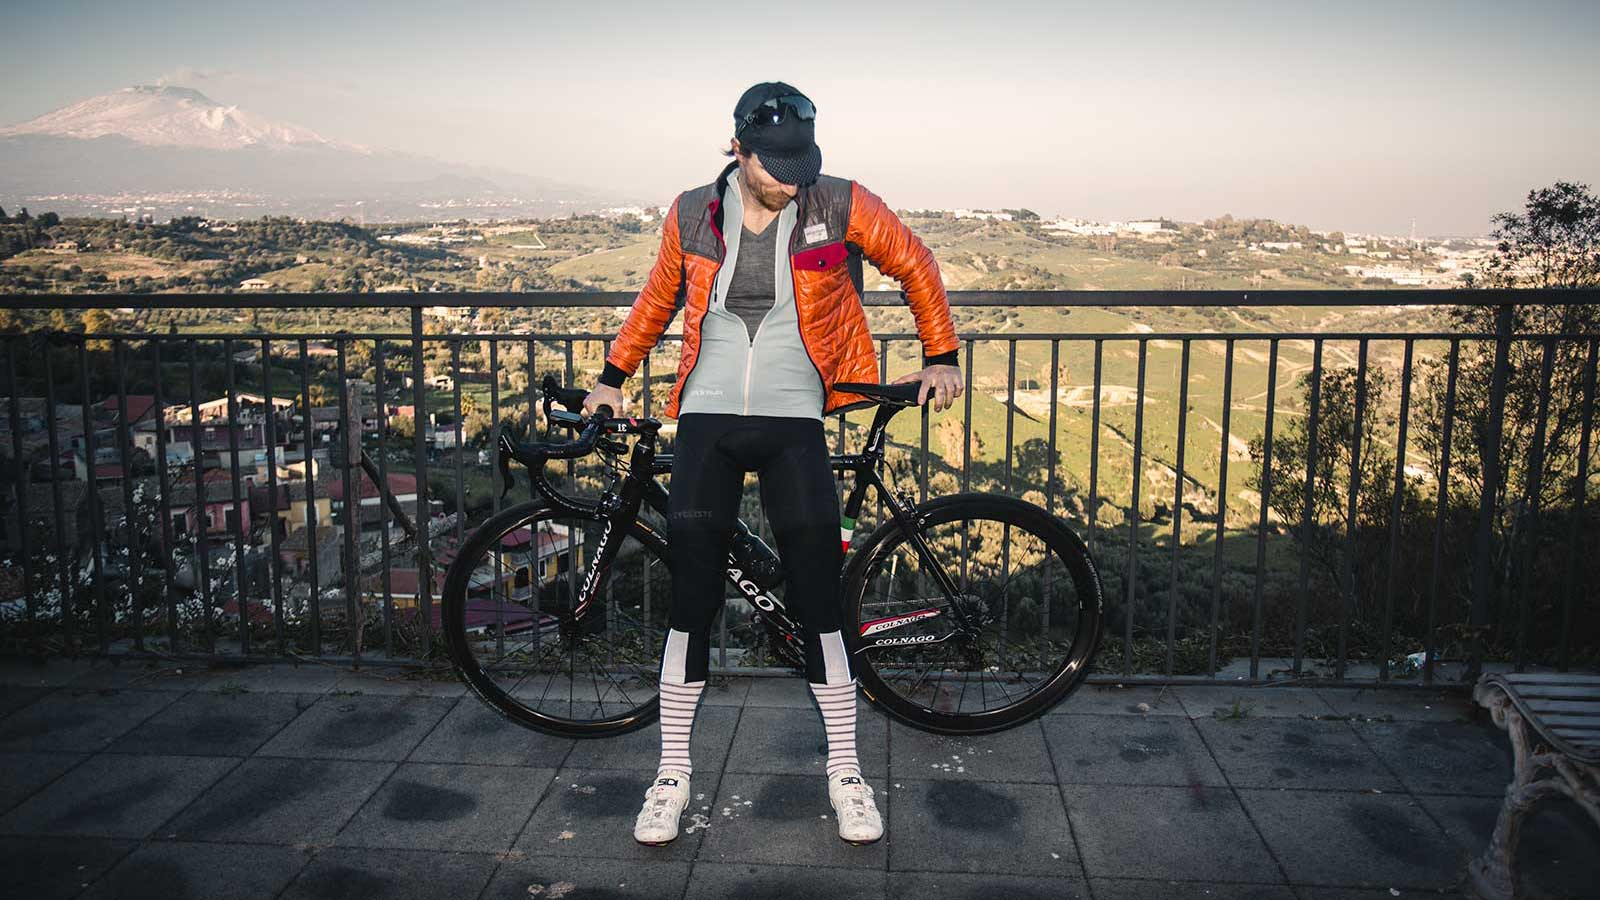 Cafe-du-cyclist41600x900